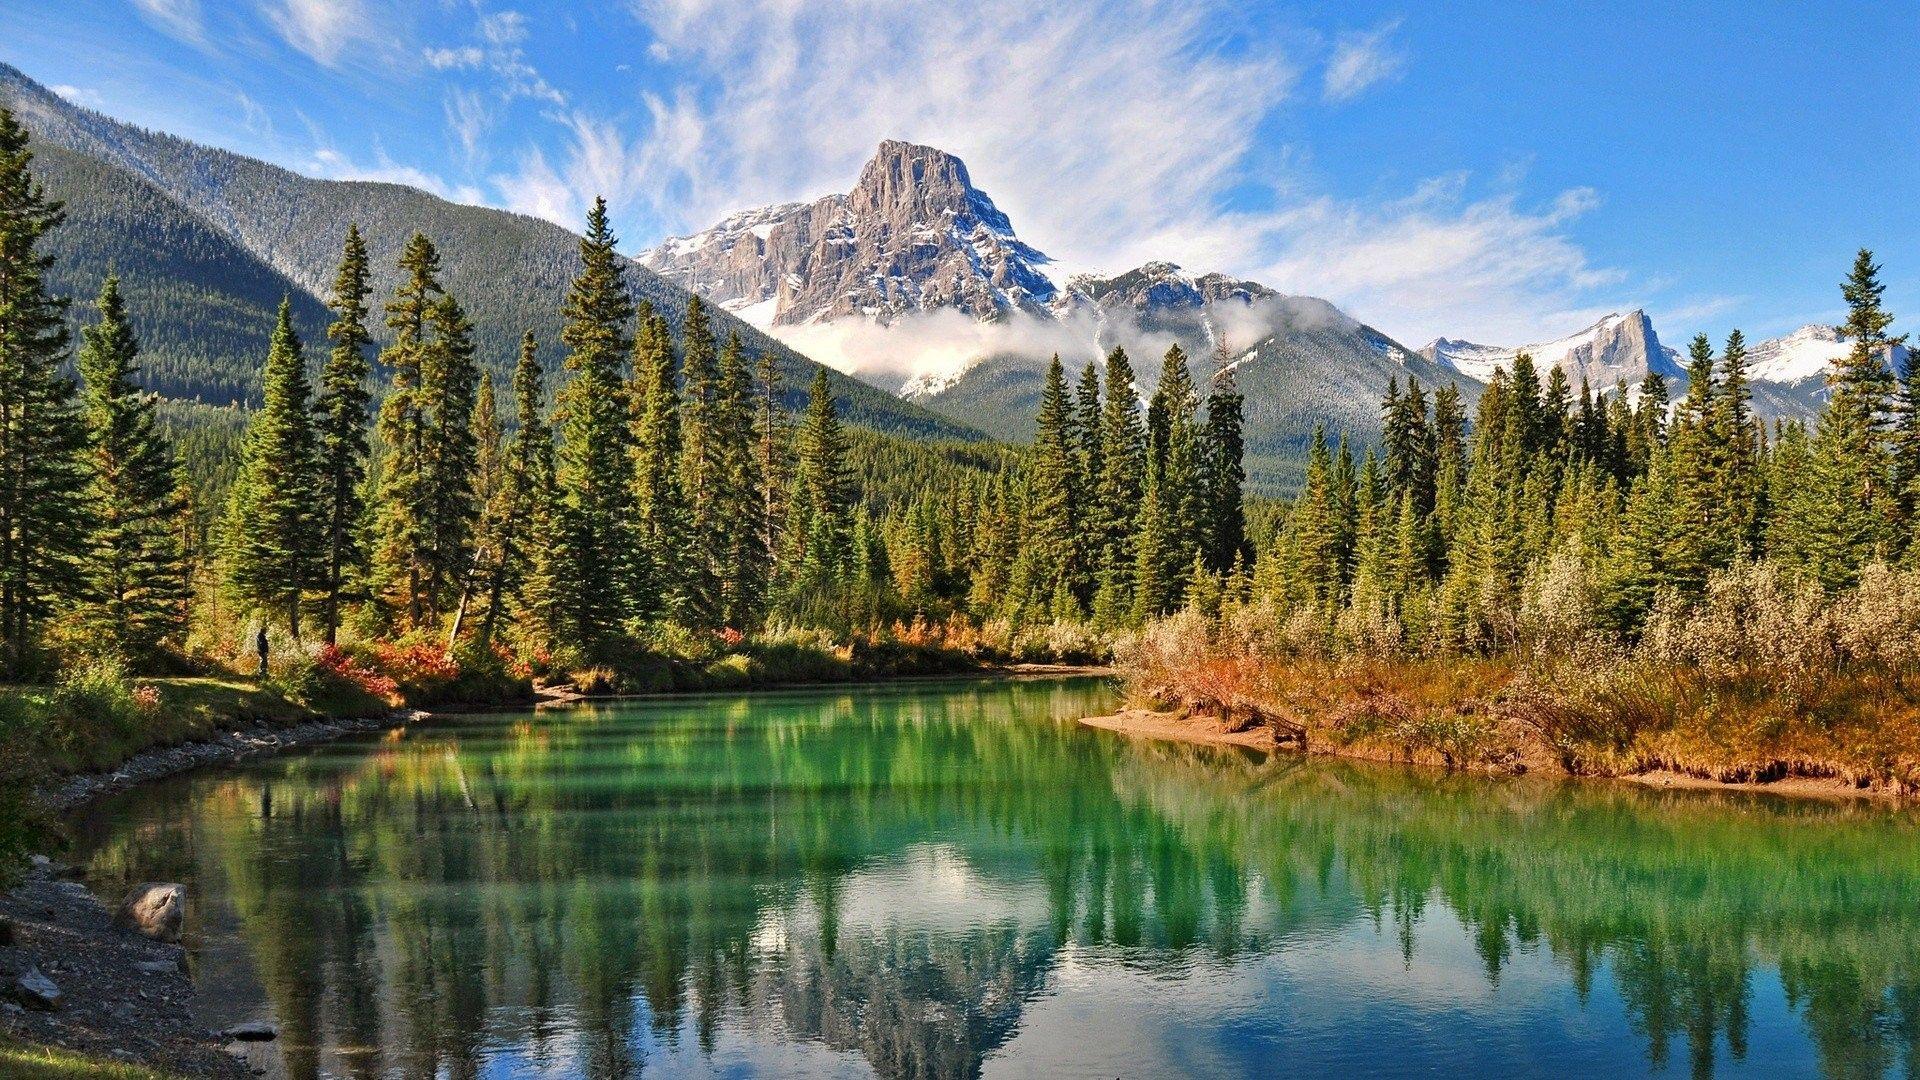 1920x1080 Mountain Nature Landscape Cloud Lake Tree Reflection